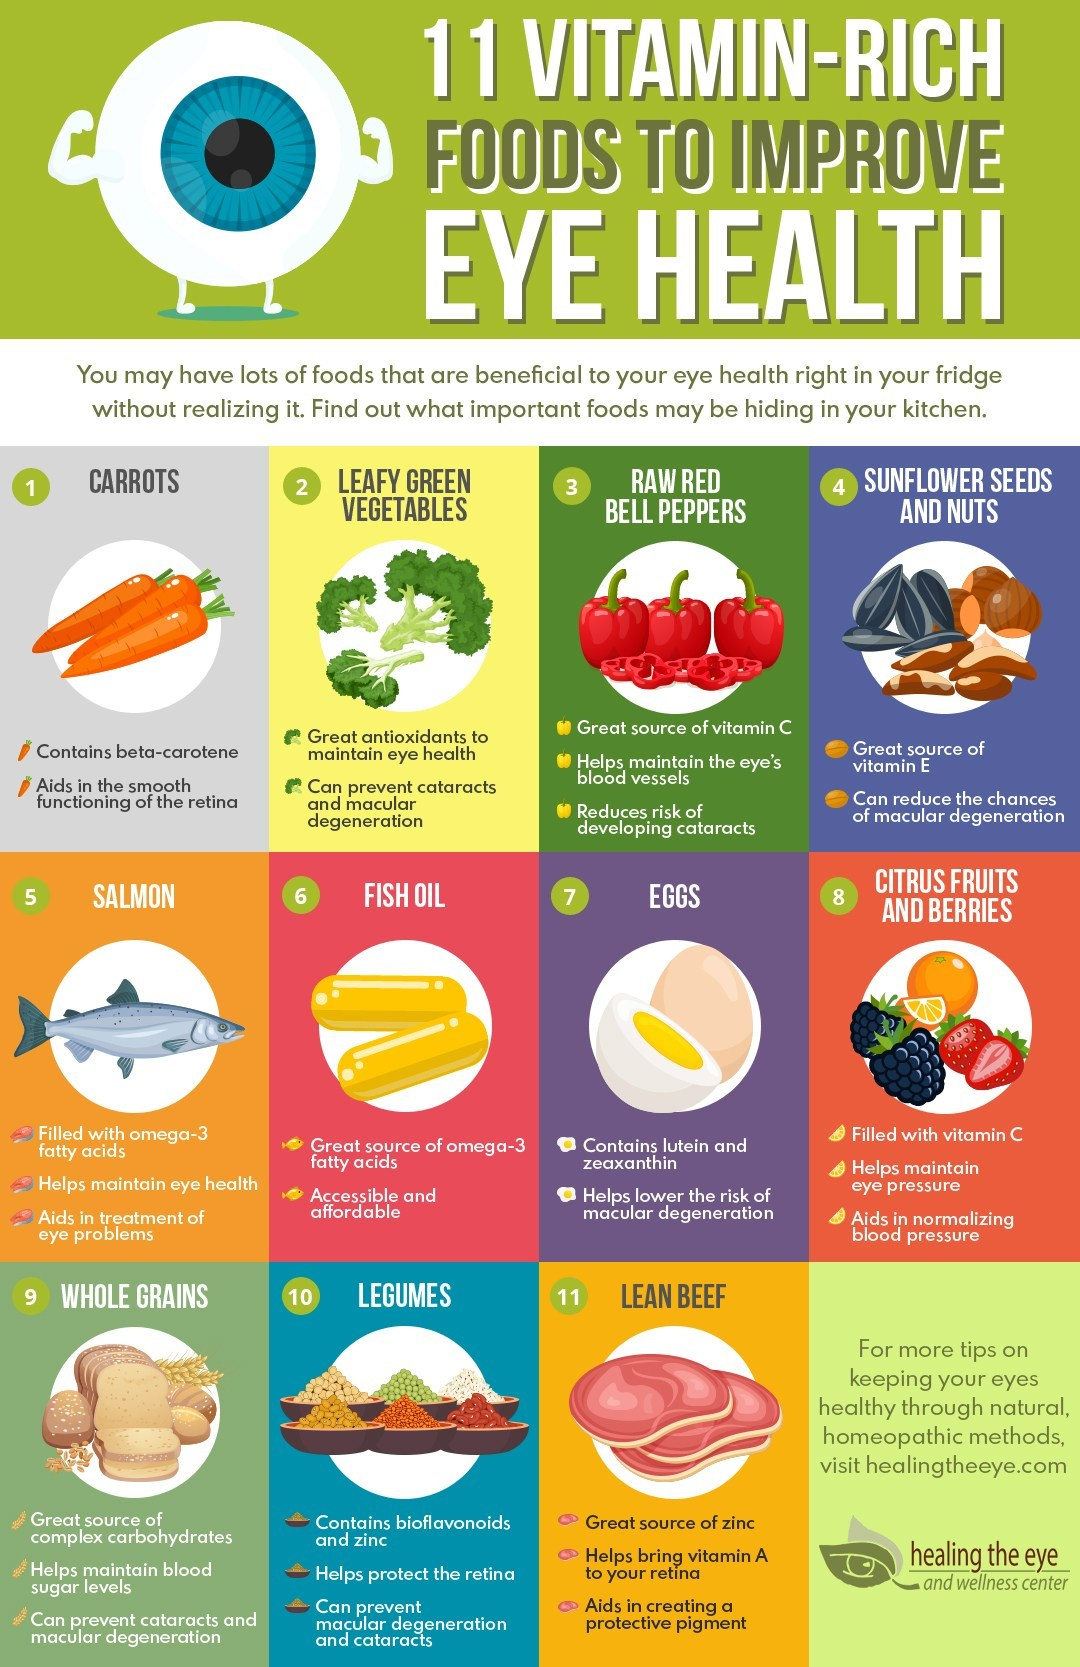 Foods to improve Eye Health